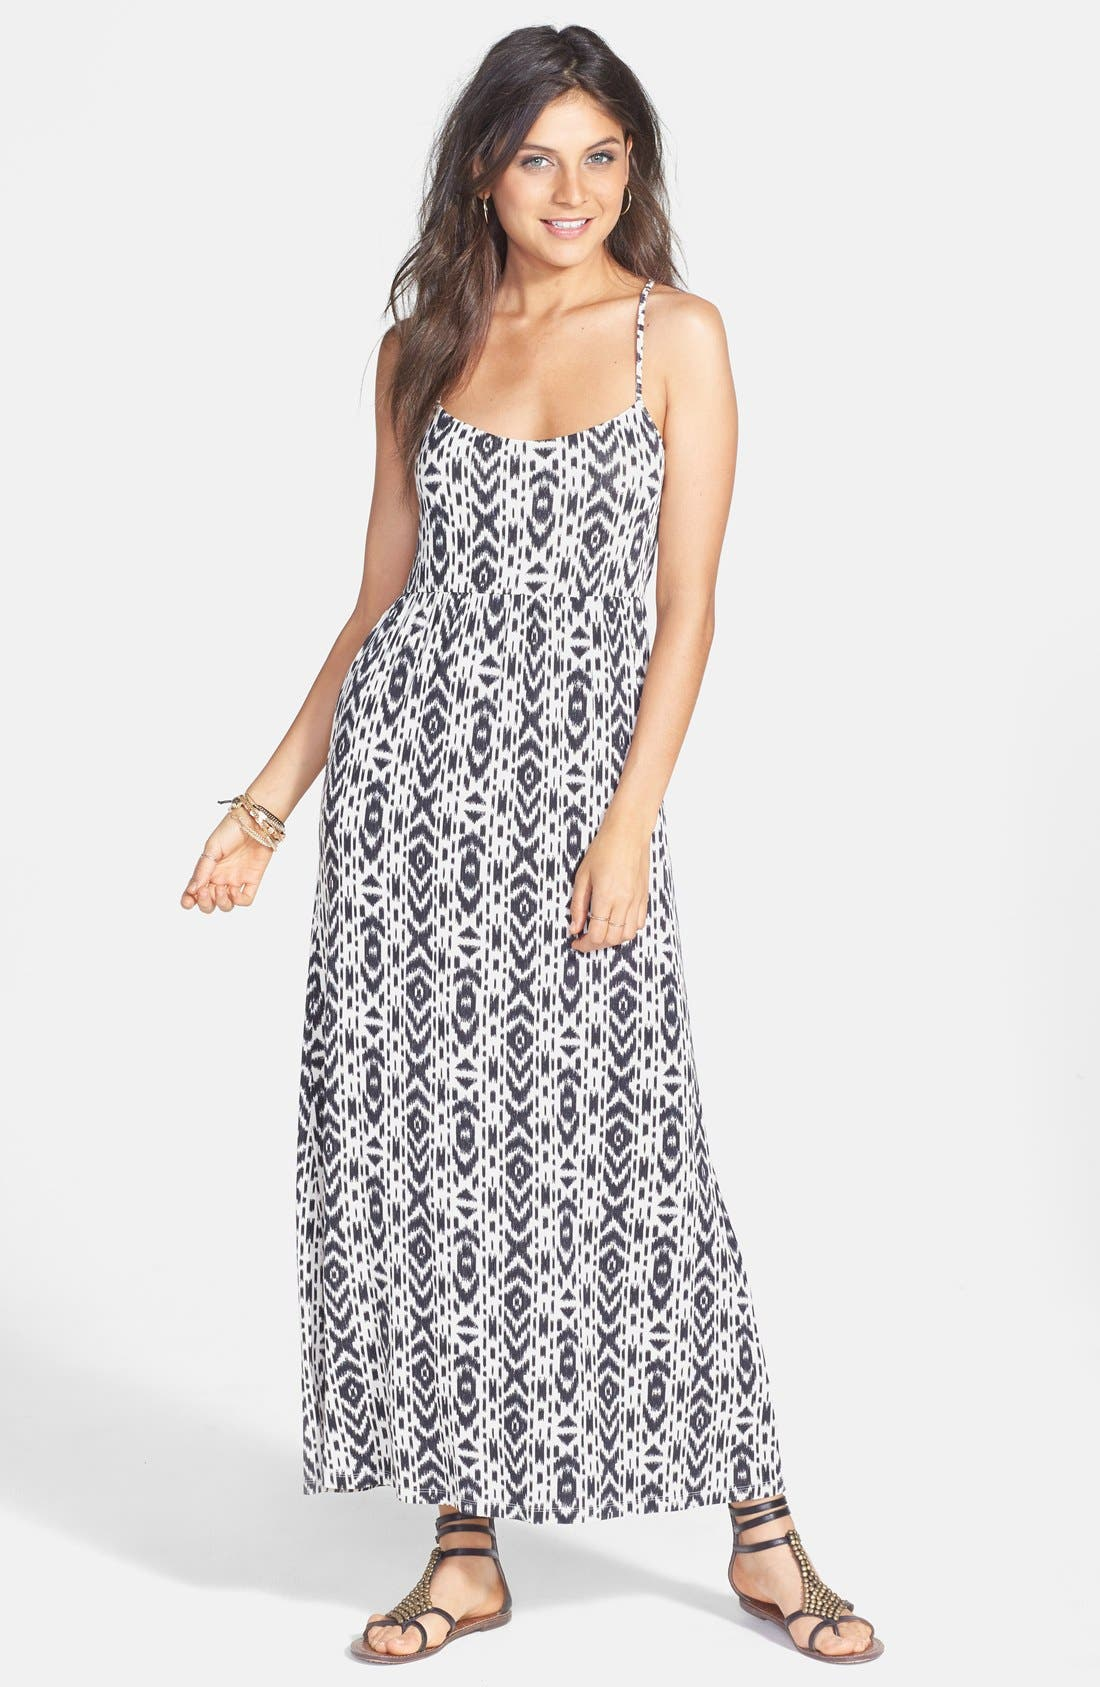 Main Image - Volcom 'Play Along' Print Strap Detail Maxi Dress